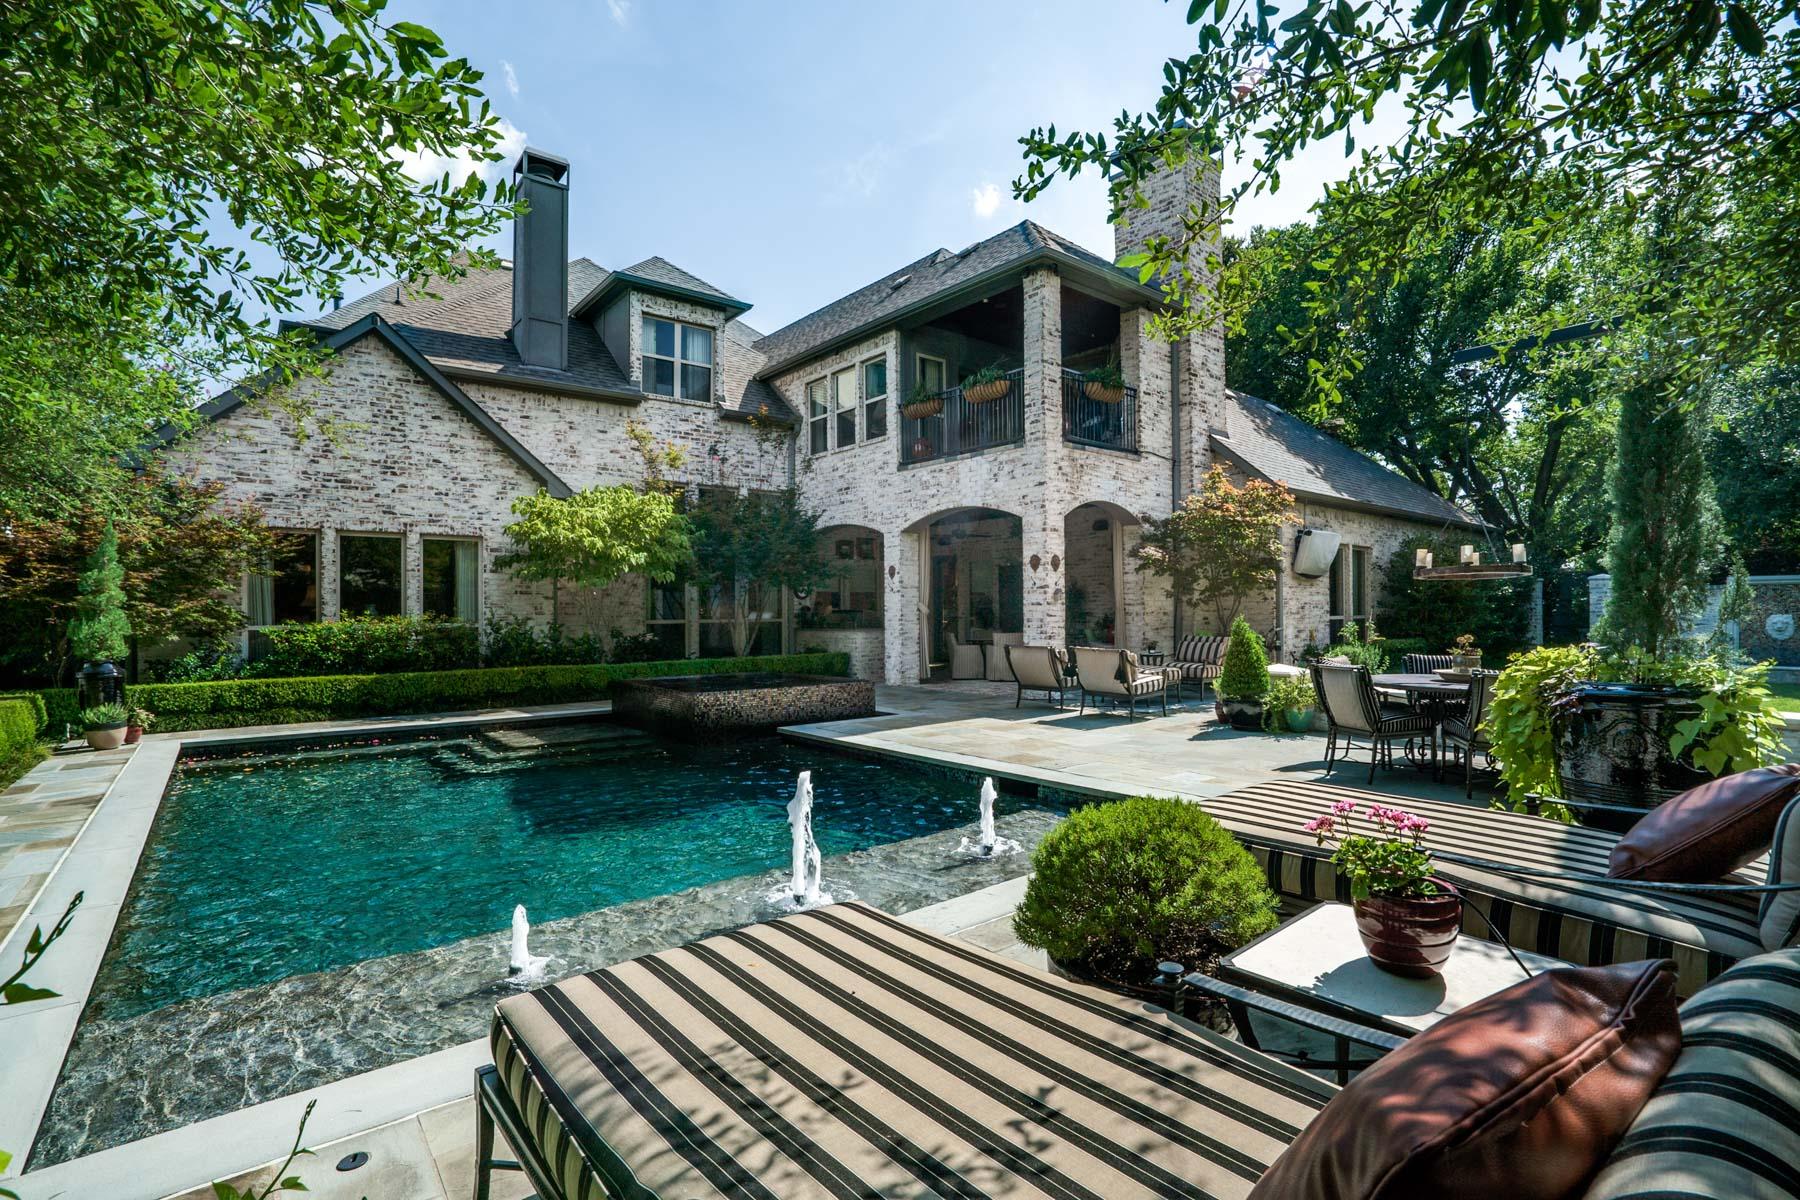 独户住宅 为 销售 在 Exquisite Detail in Preston Hollow 5757 Preston Haven Drive 达拉斯, 得克萨斯州, 75230 美国